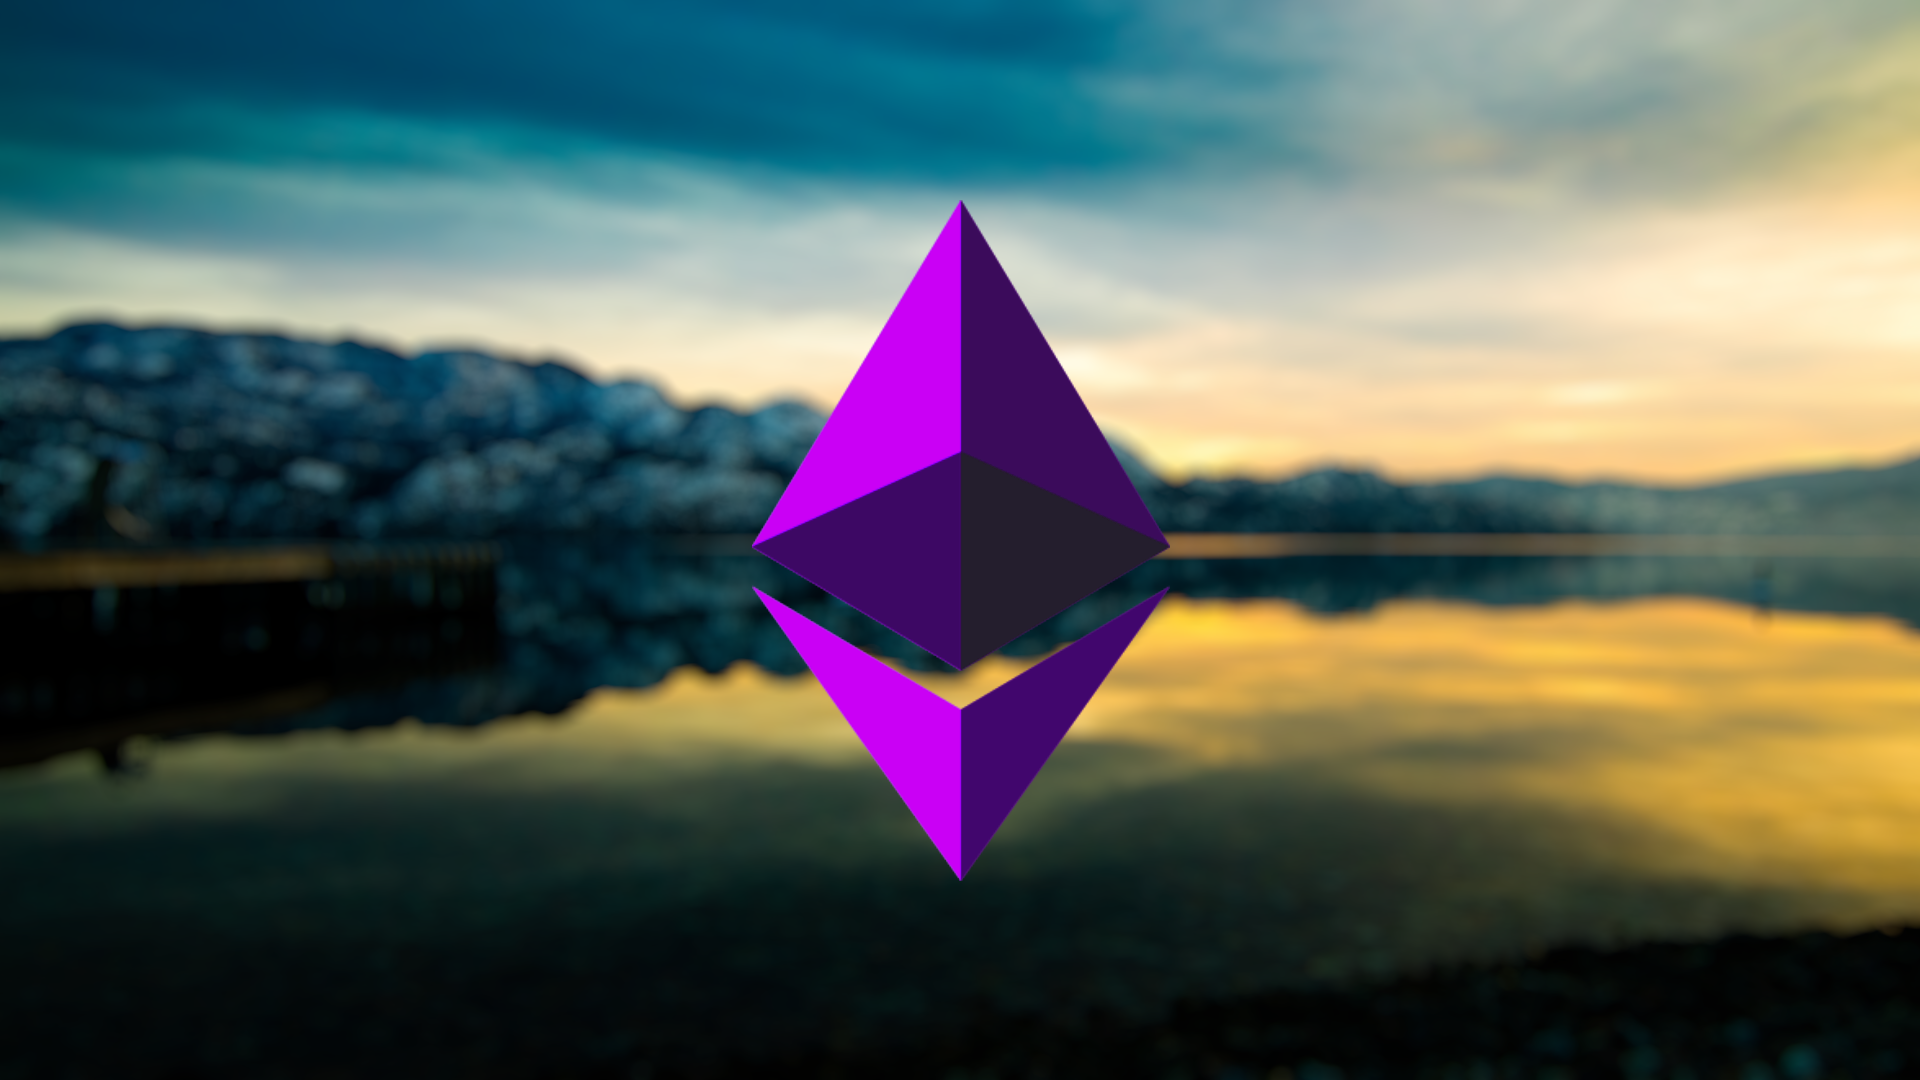 Purple Ethereum (1080p) Wallpaper, R wallpaper, High